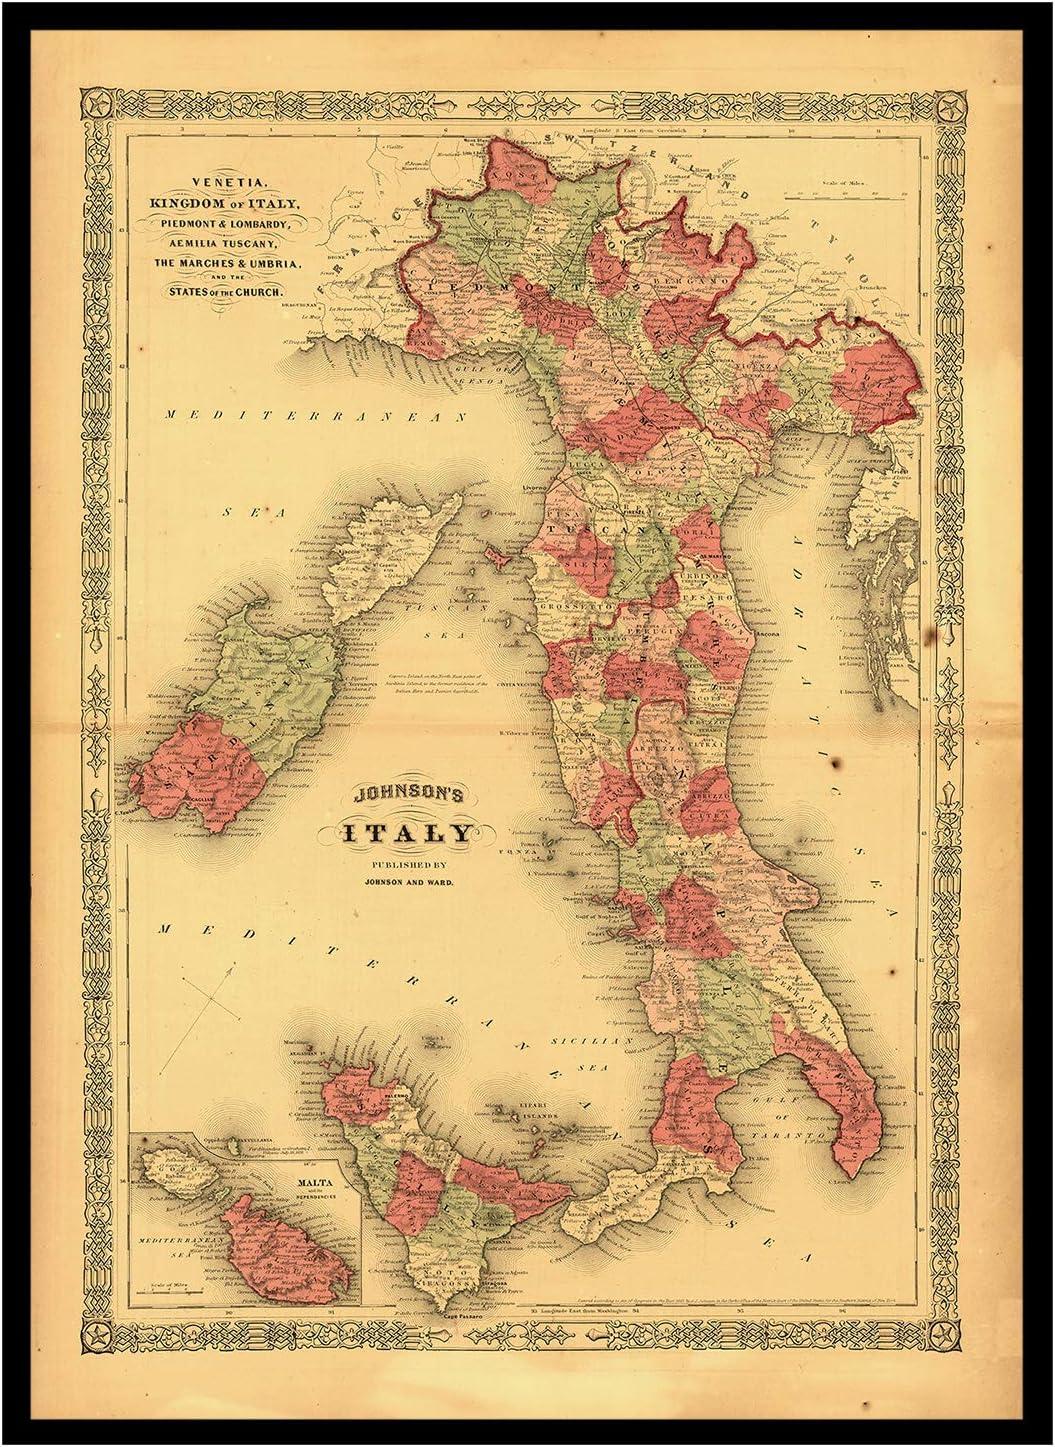 mapa plegado Old Maps Library Mapa de reproducci/ón vintage de Italia 1864 con reverso de lino 37x52